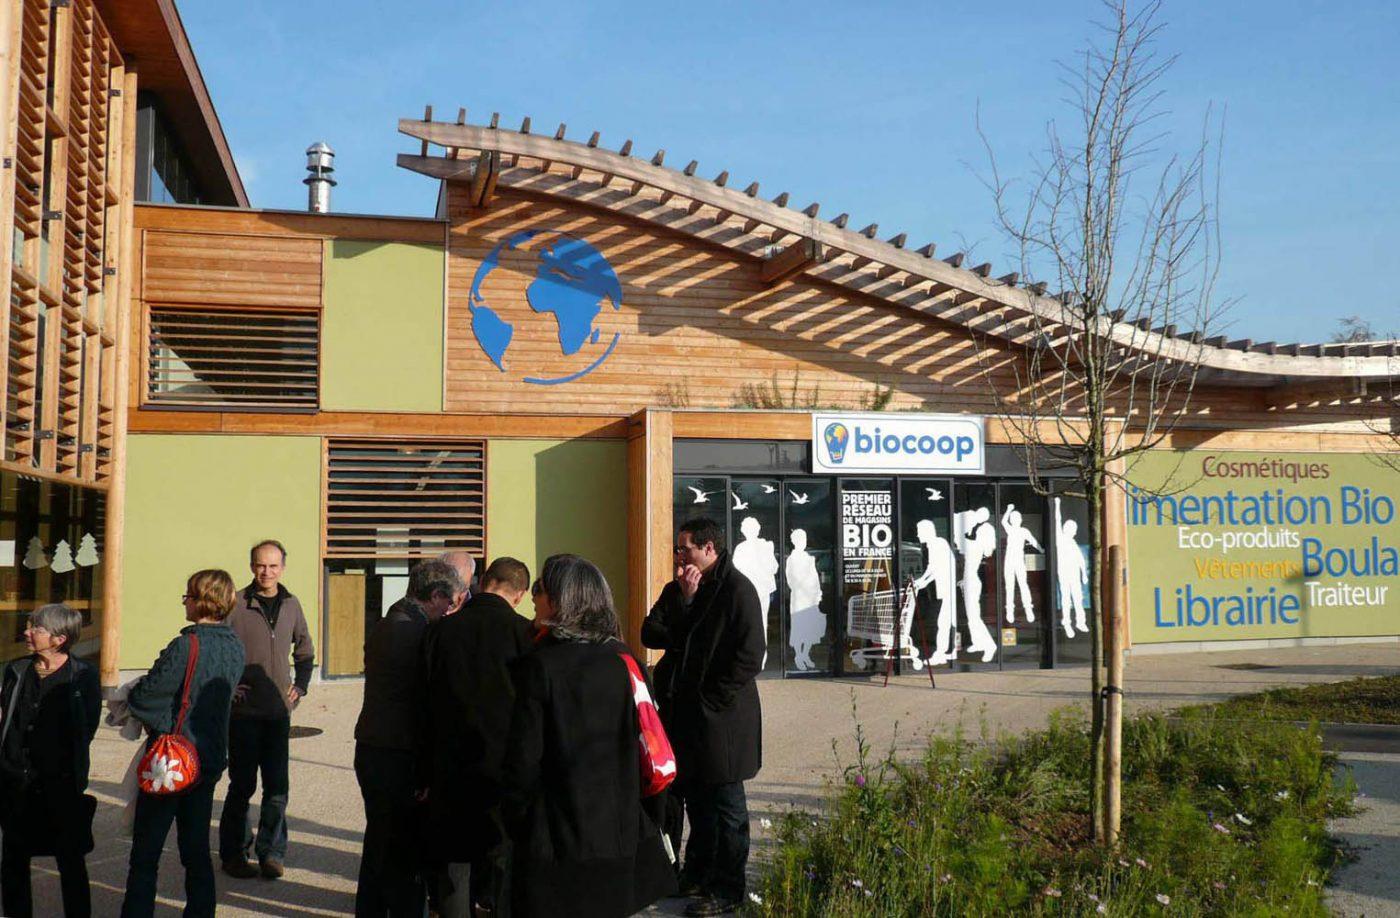 Entrée magasin Biocoop Le Mantois - Epône